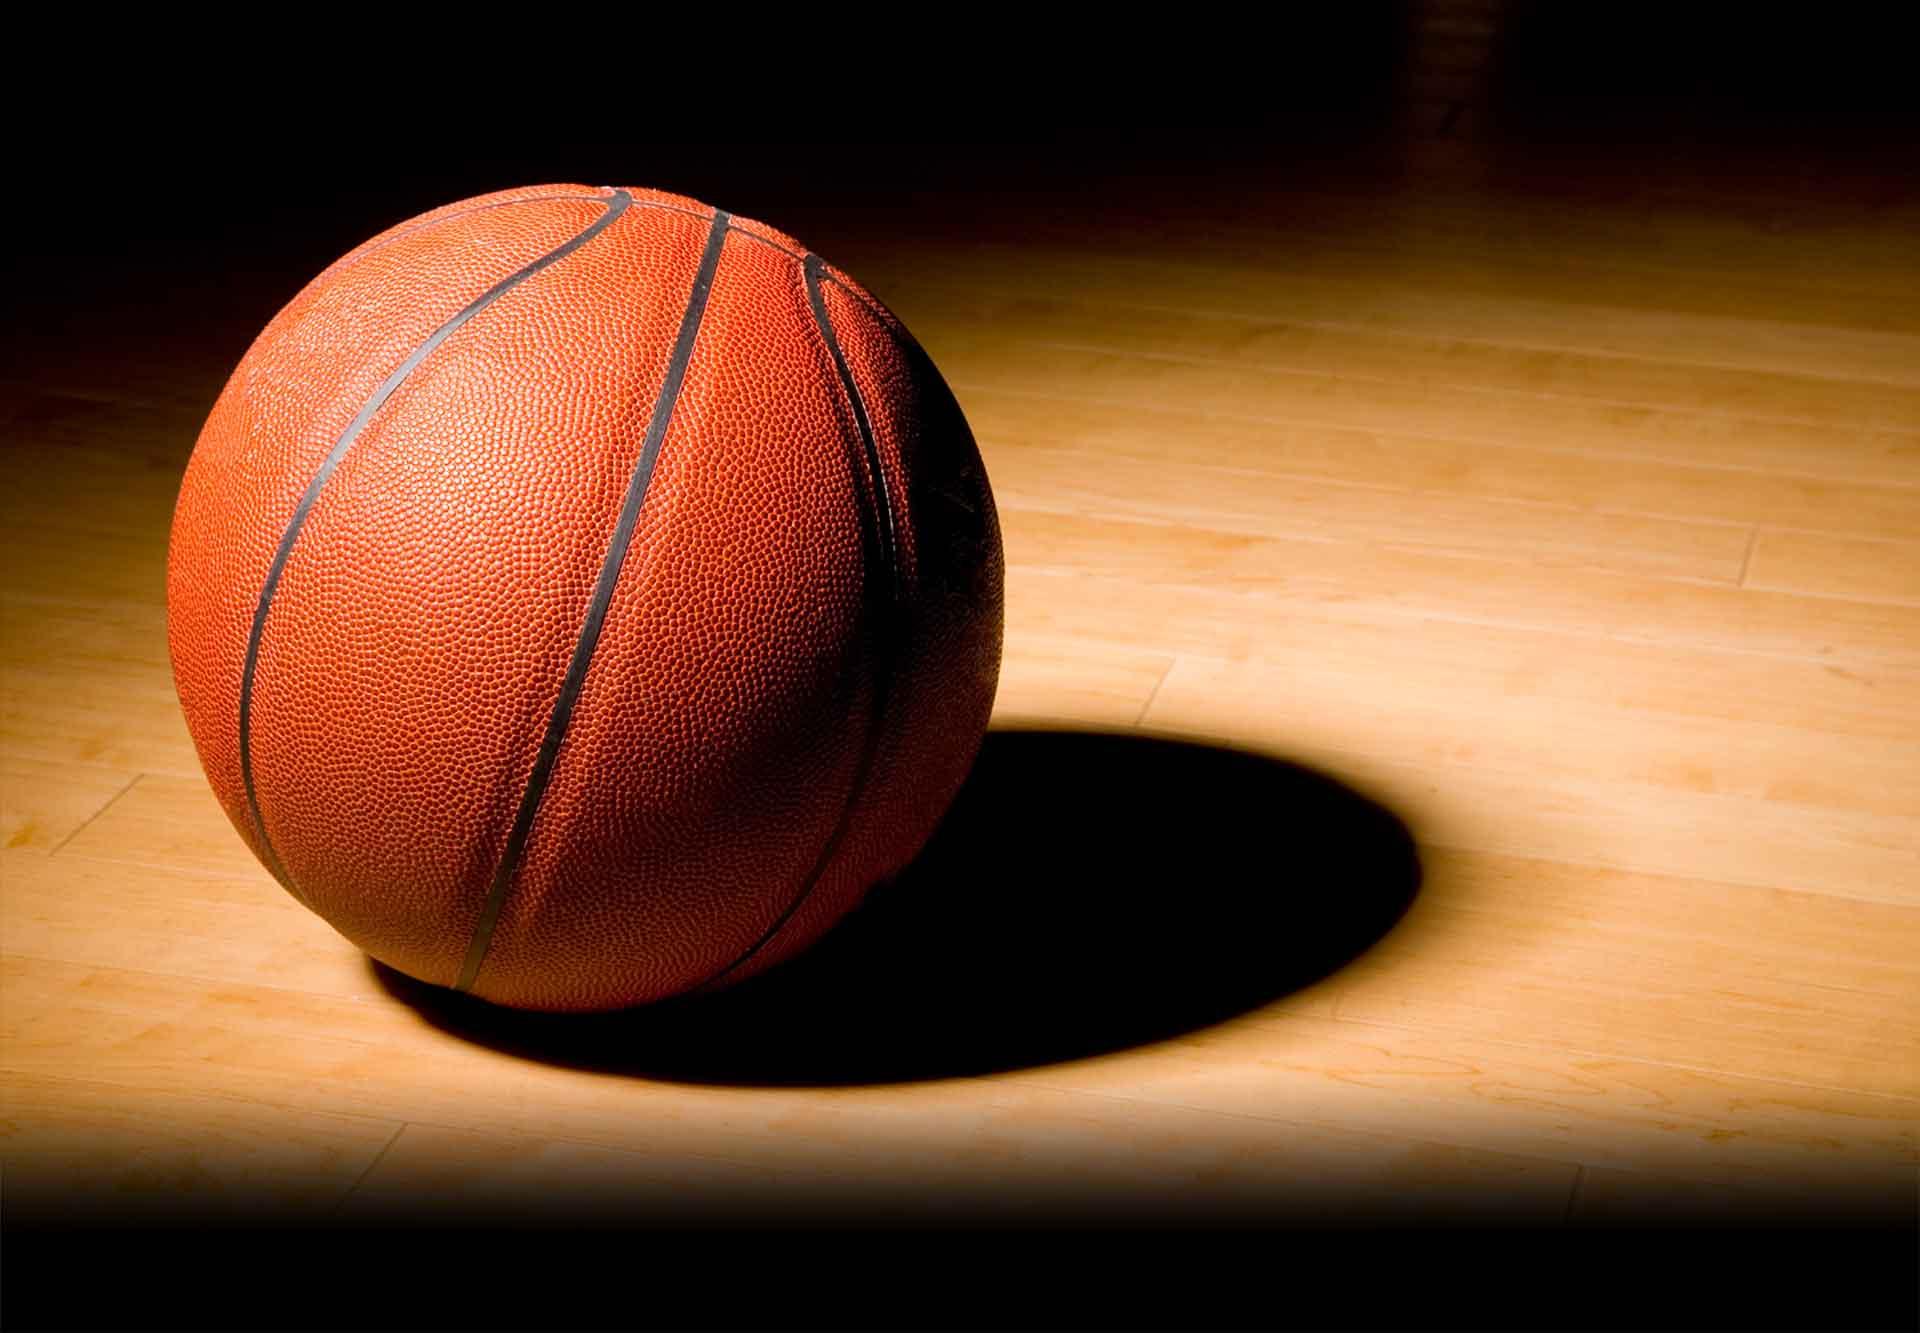 Basketball backgrounds for twitter